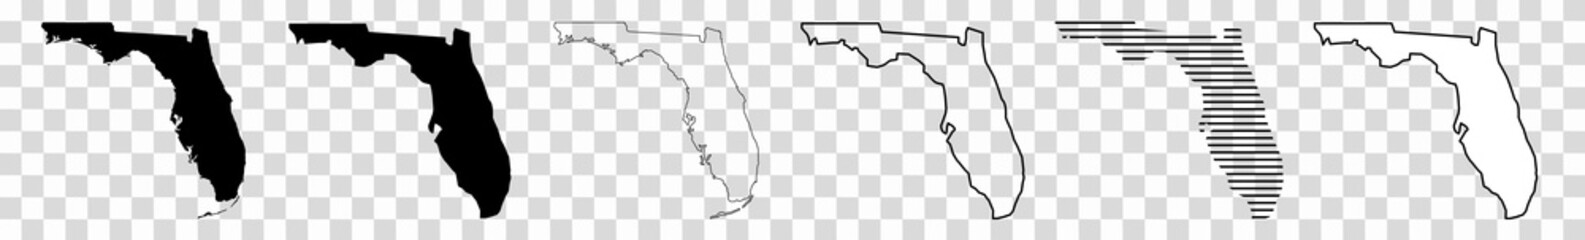 Florida Map Black | State Border | United States | US America | Transparent Isolated | Variations